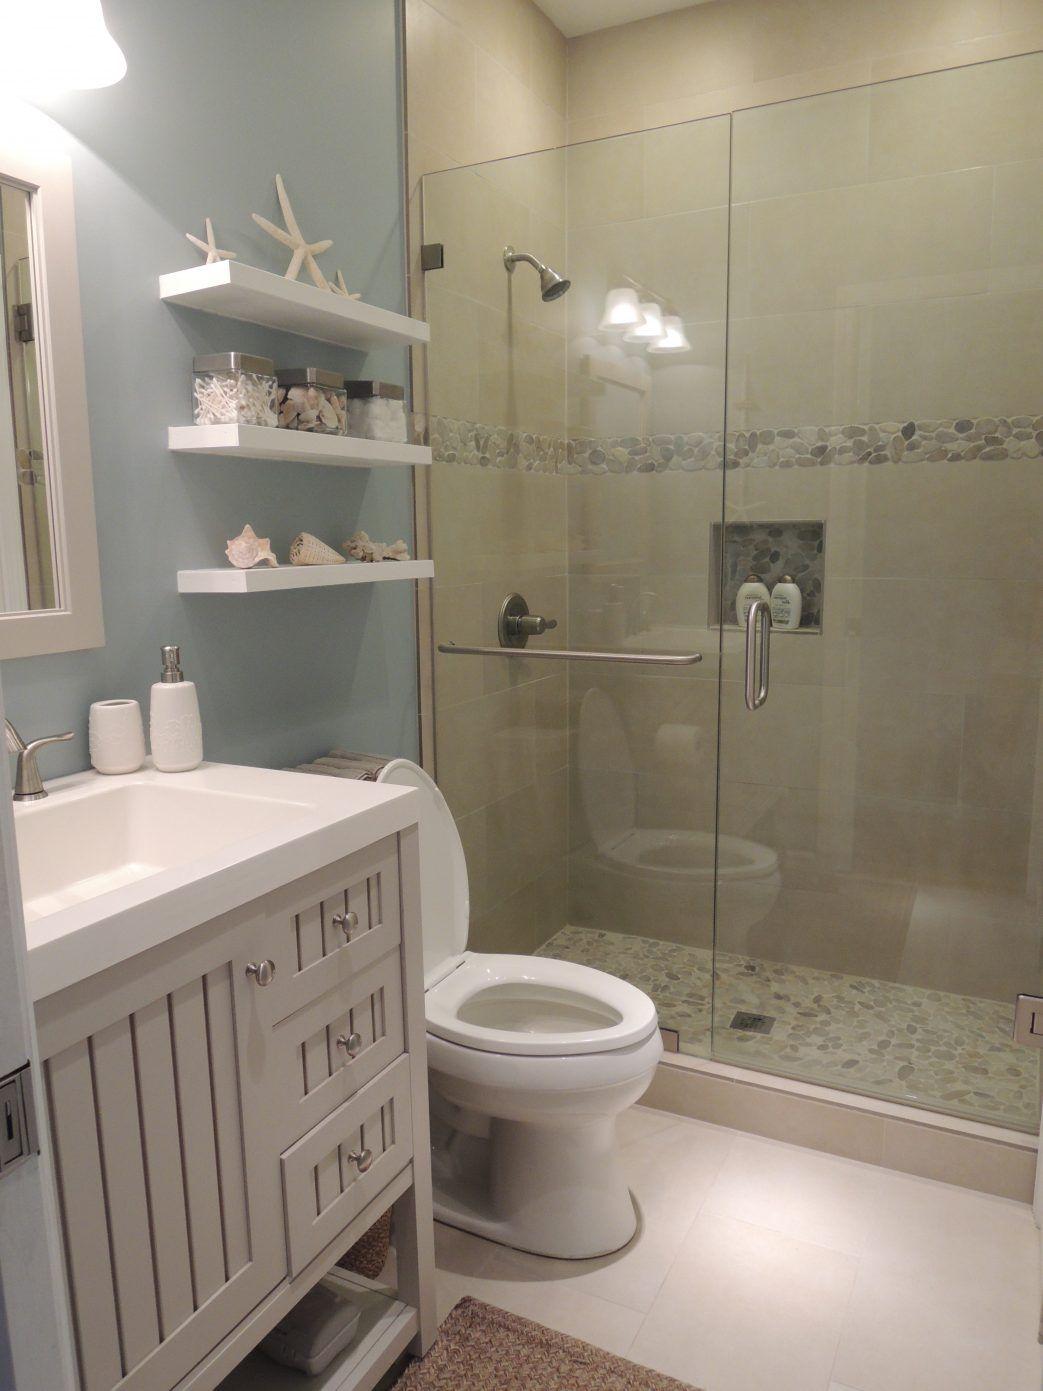 Sea Themed Bathroom Towelsach Small Ideas Seashell Accessories